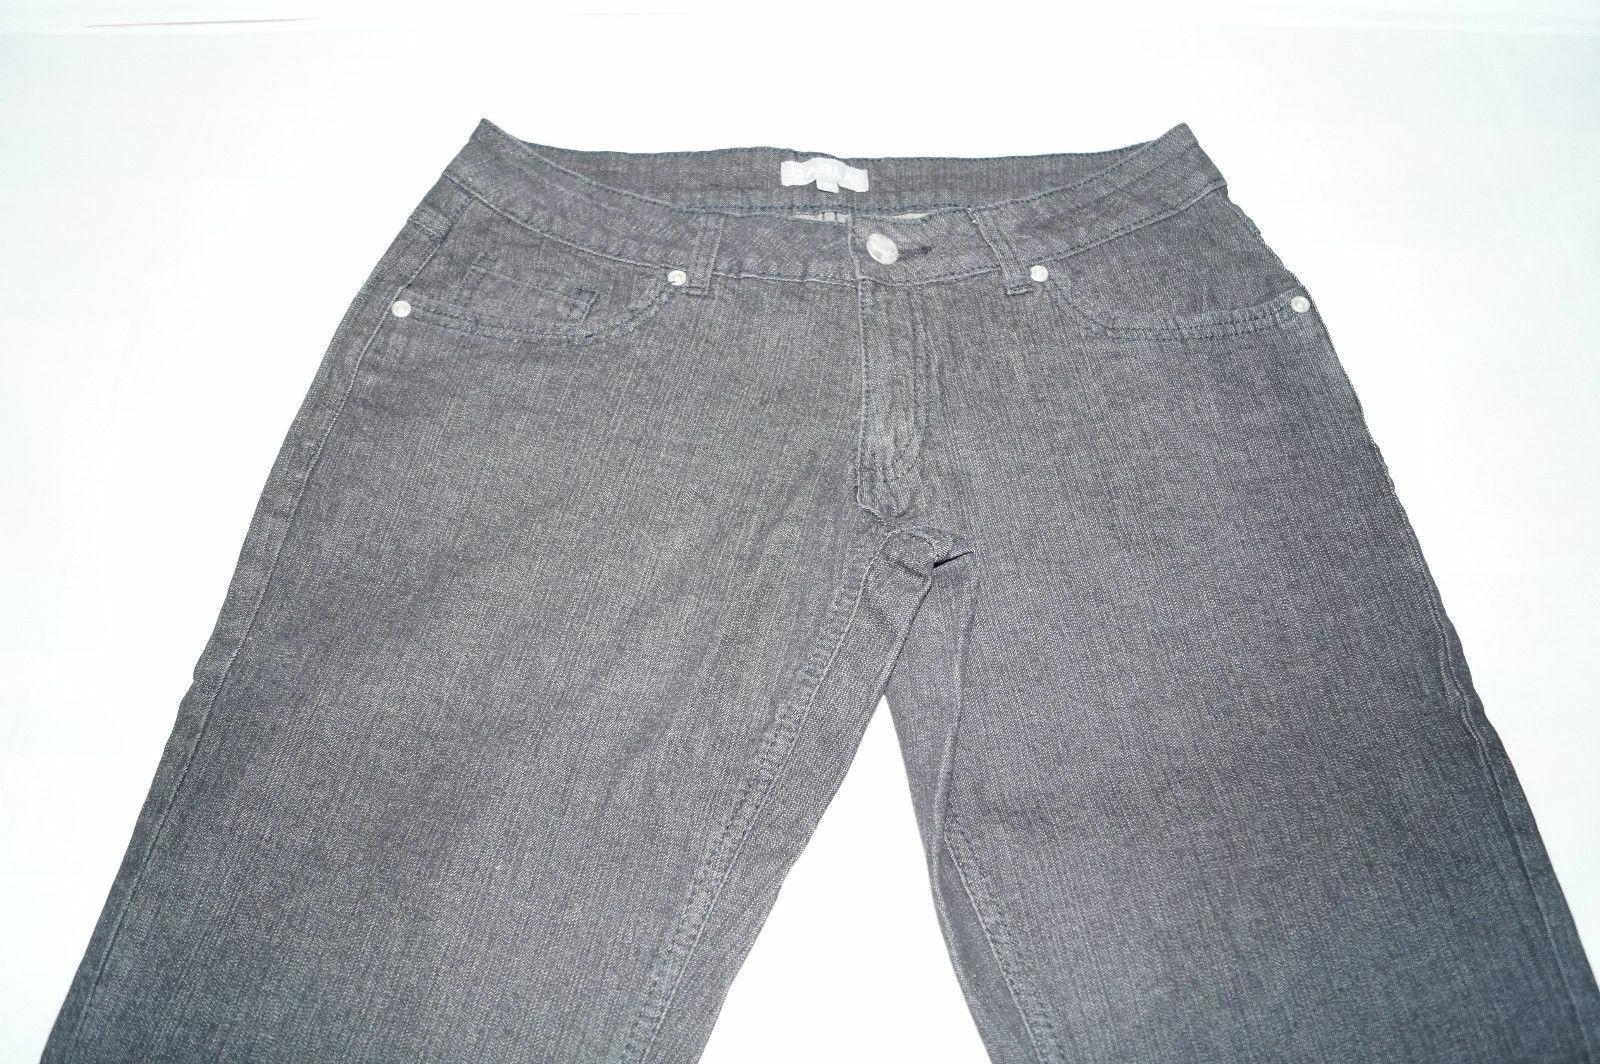 Damen-Stretch-Jeans-9-versch-Modelle-Jeanshose-Hose-Elasthan-bequem-Oko-Tex Indexbild 11